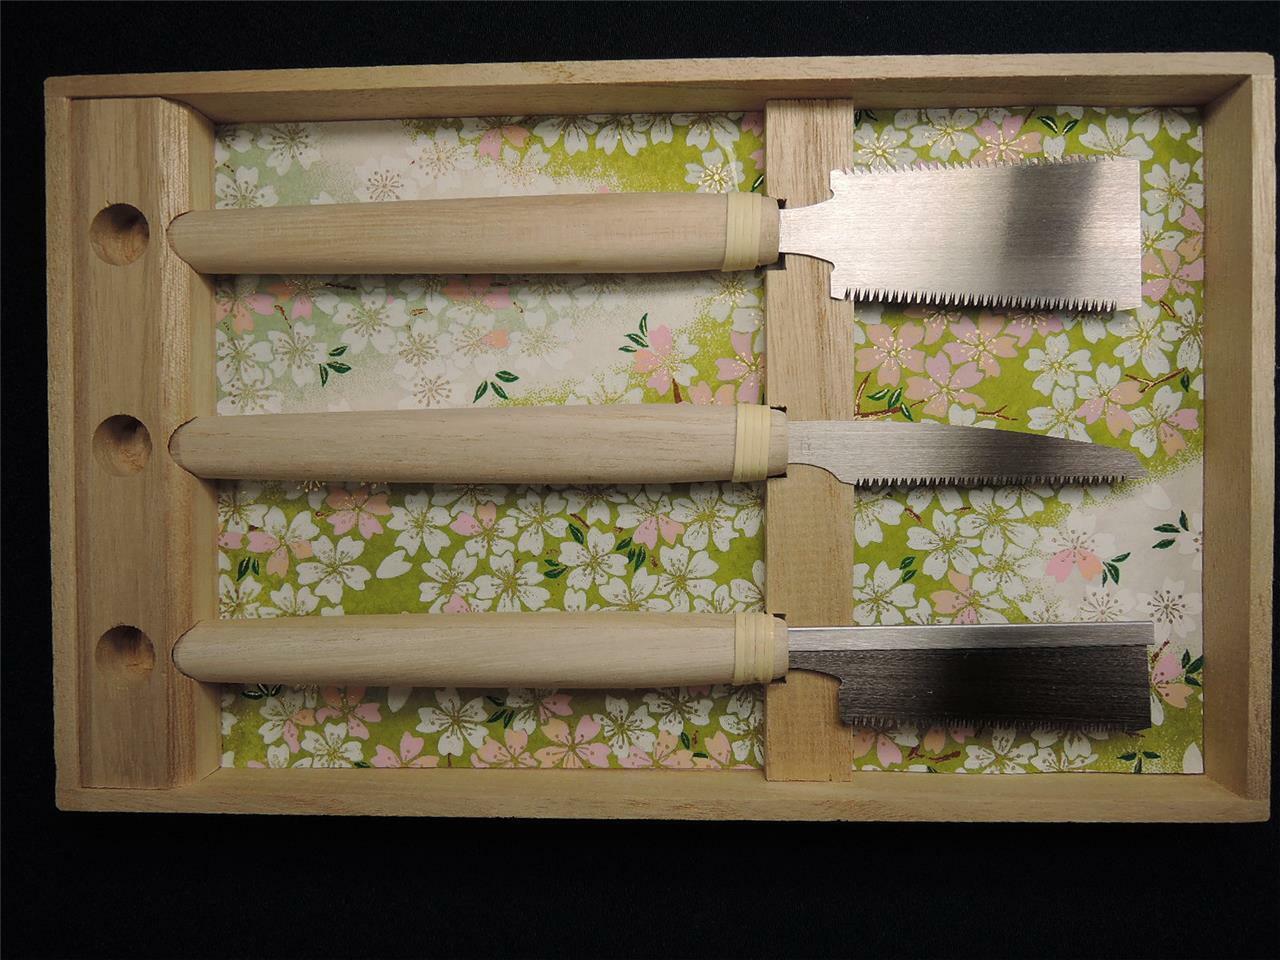 Japanese Hishika Bessho Jiro SENNEN SAKURA Precision Woodwork Saws Set of Three